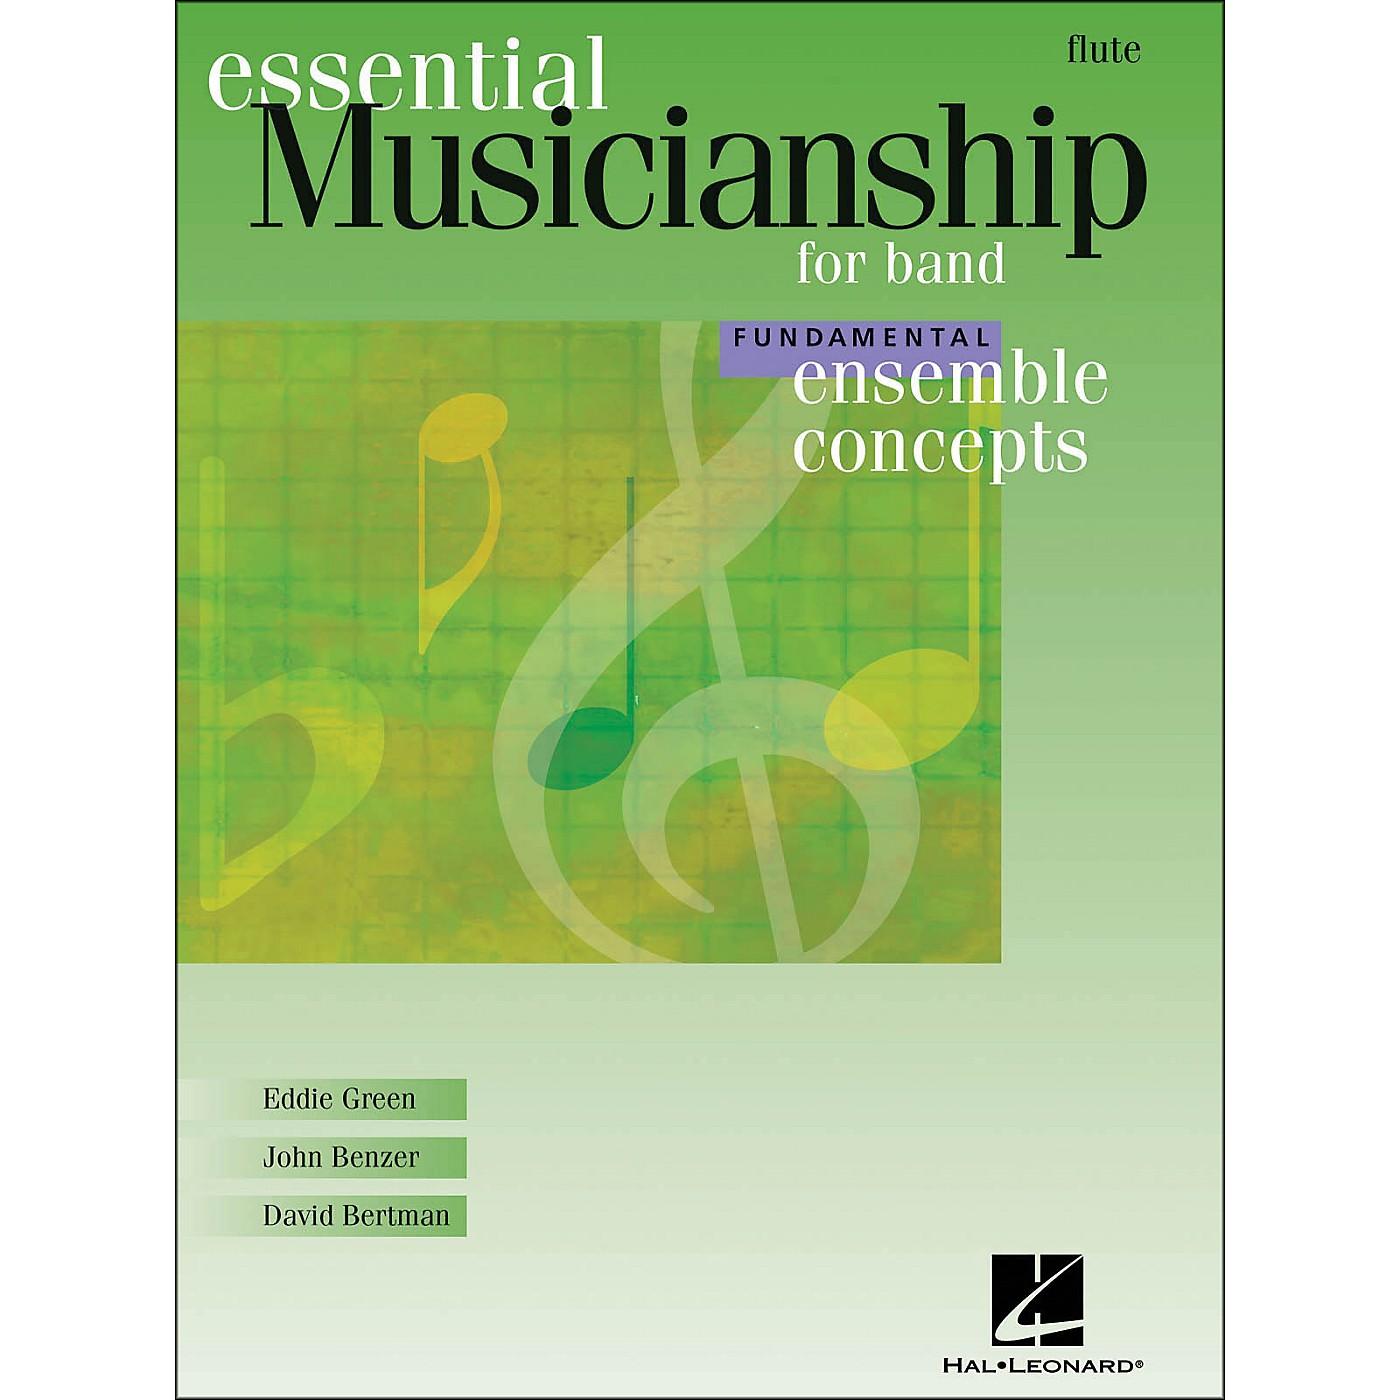 Hal Leonard Ensemble Concepts for Band - Fundamental Level Flute thumbnail